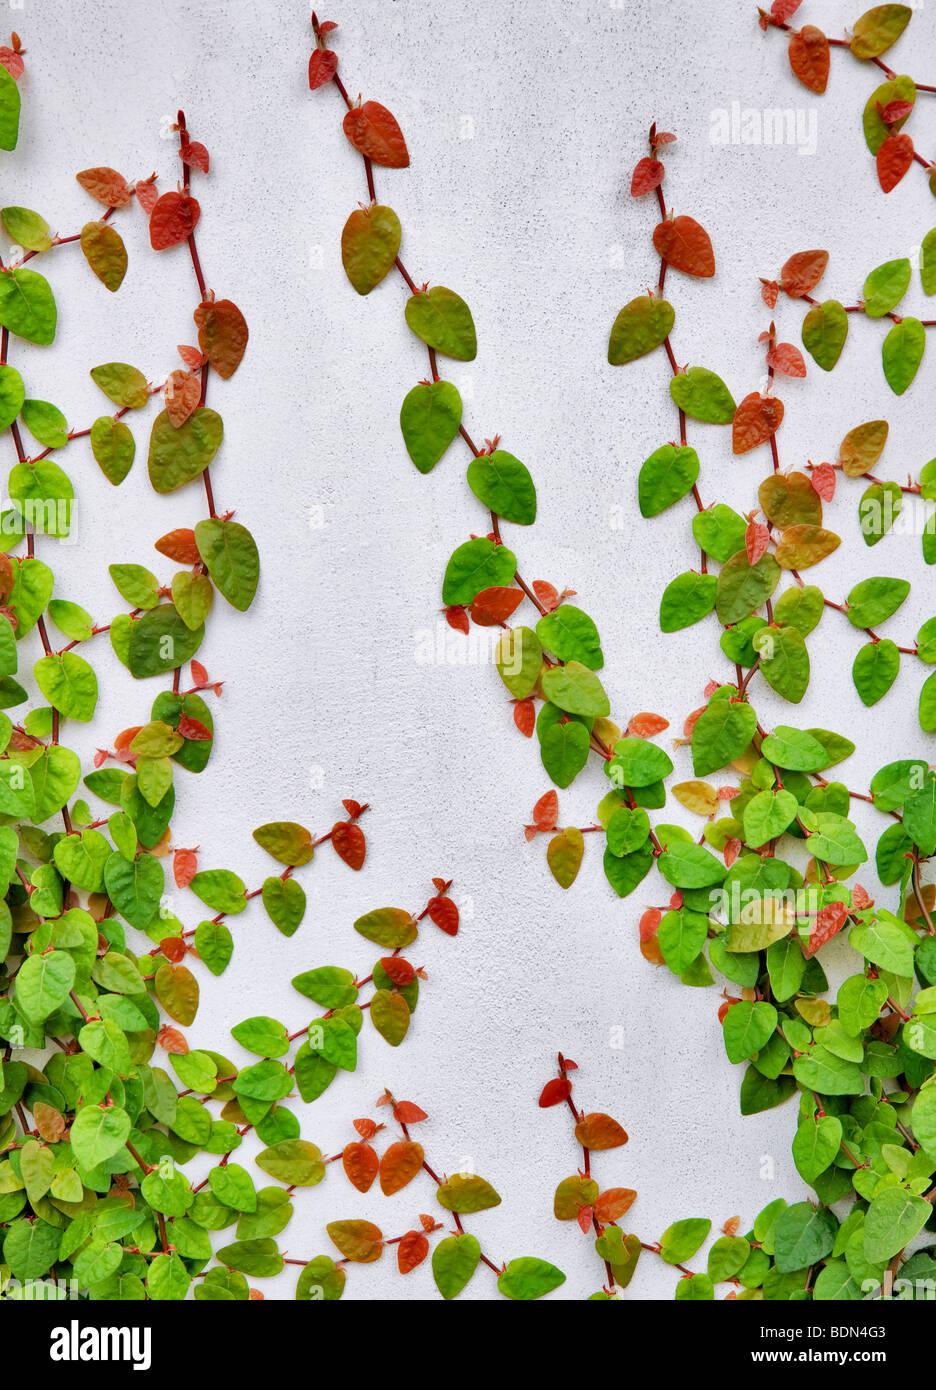 Kletterpflanze an weißer Wand. Los Angeles, CA Stockbild